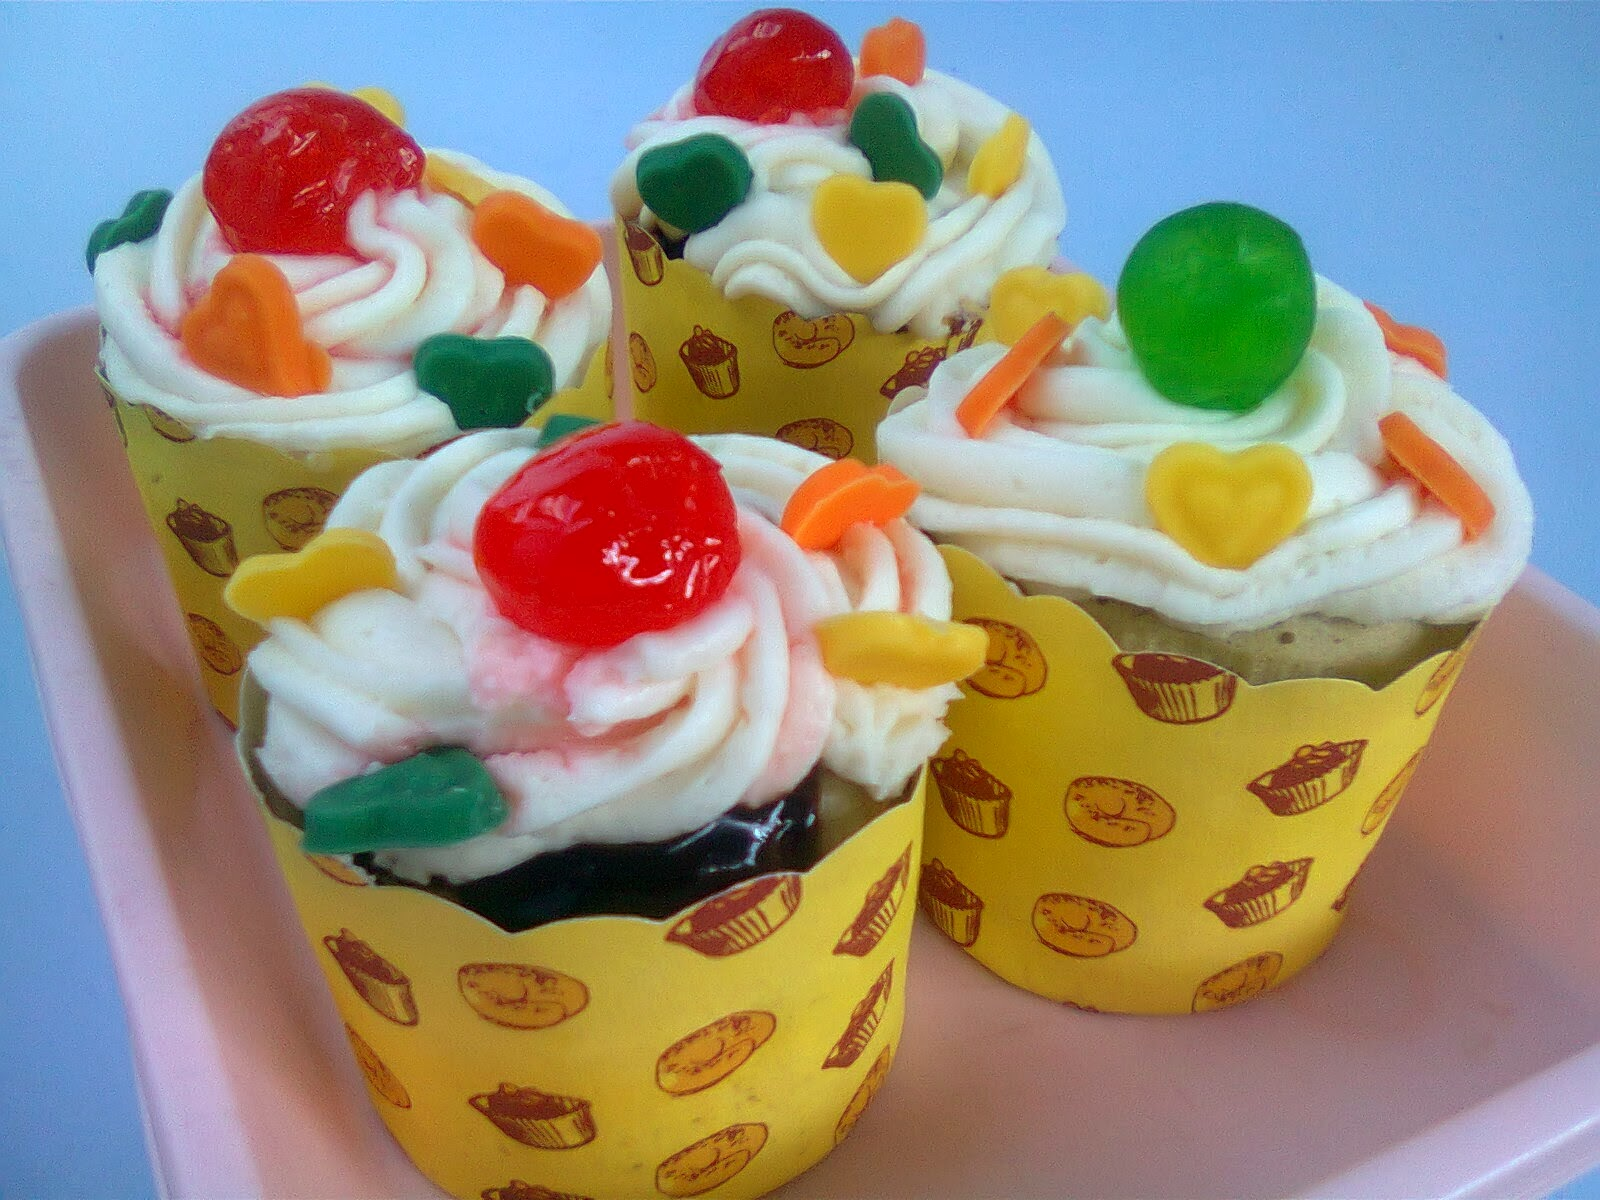 Resep Cake Kukus Keju Ncc: Resep Cupcake Kukus Hias Buah